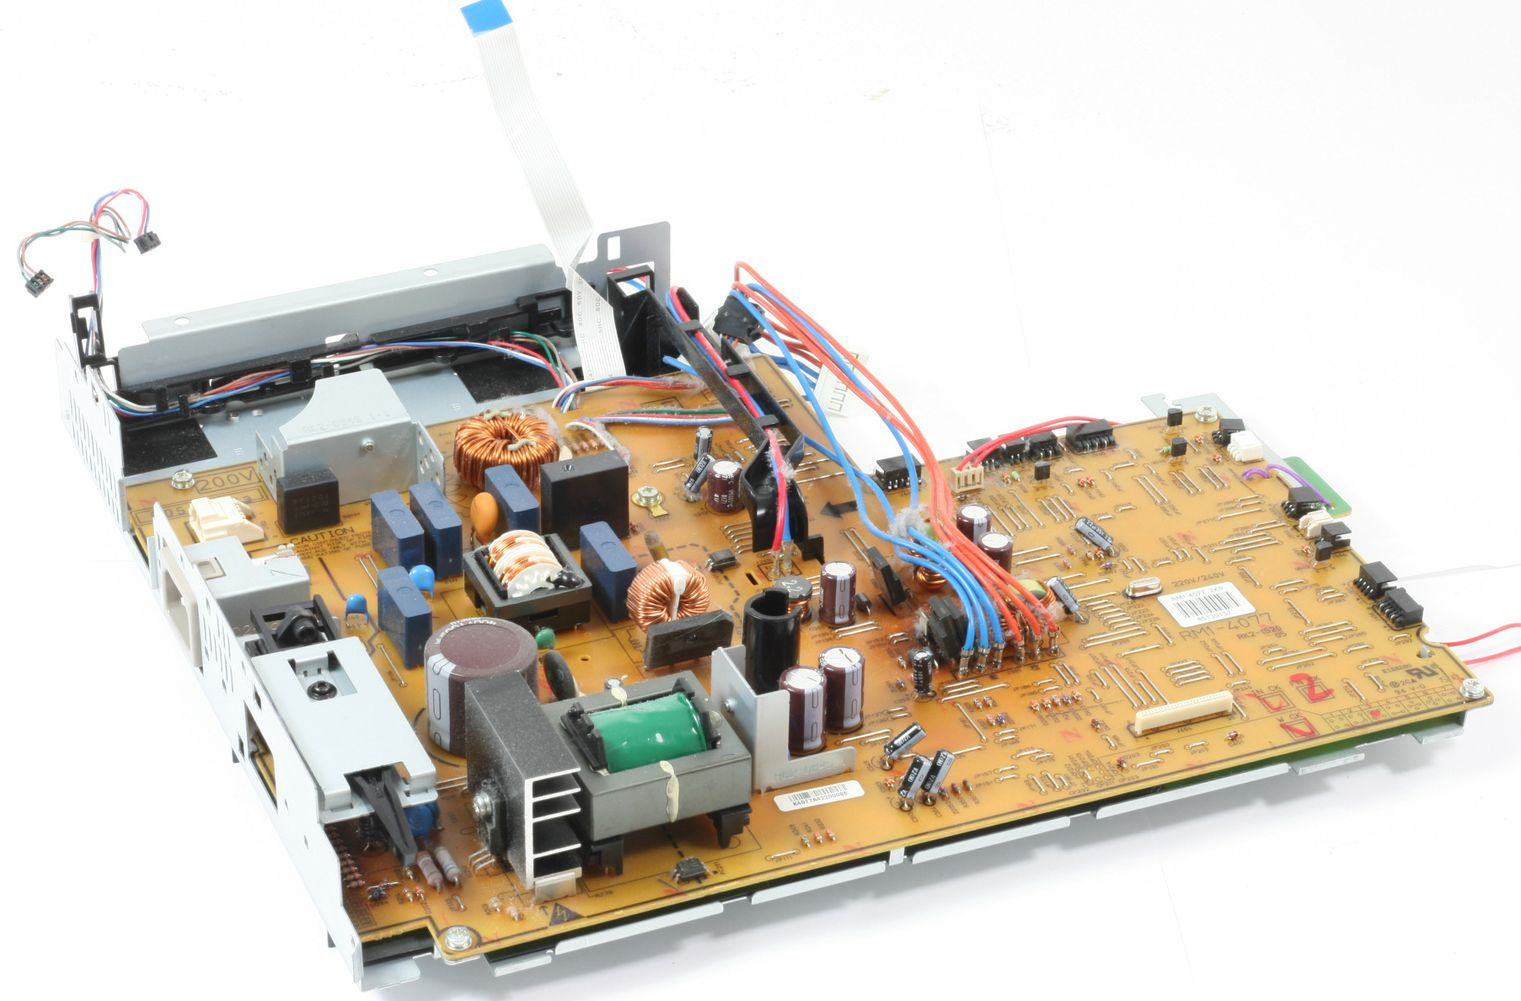 HP Netzteil RM1-4077 POWER SUPPLY Laserjet M3035 MFP M3027 MFP gebraucht